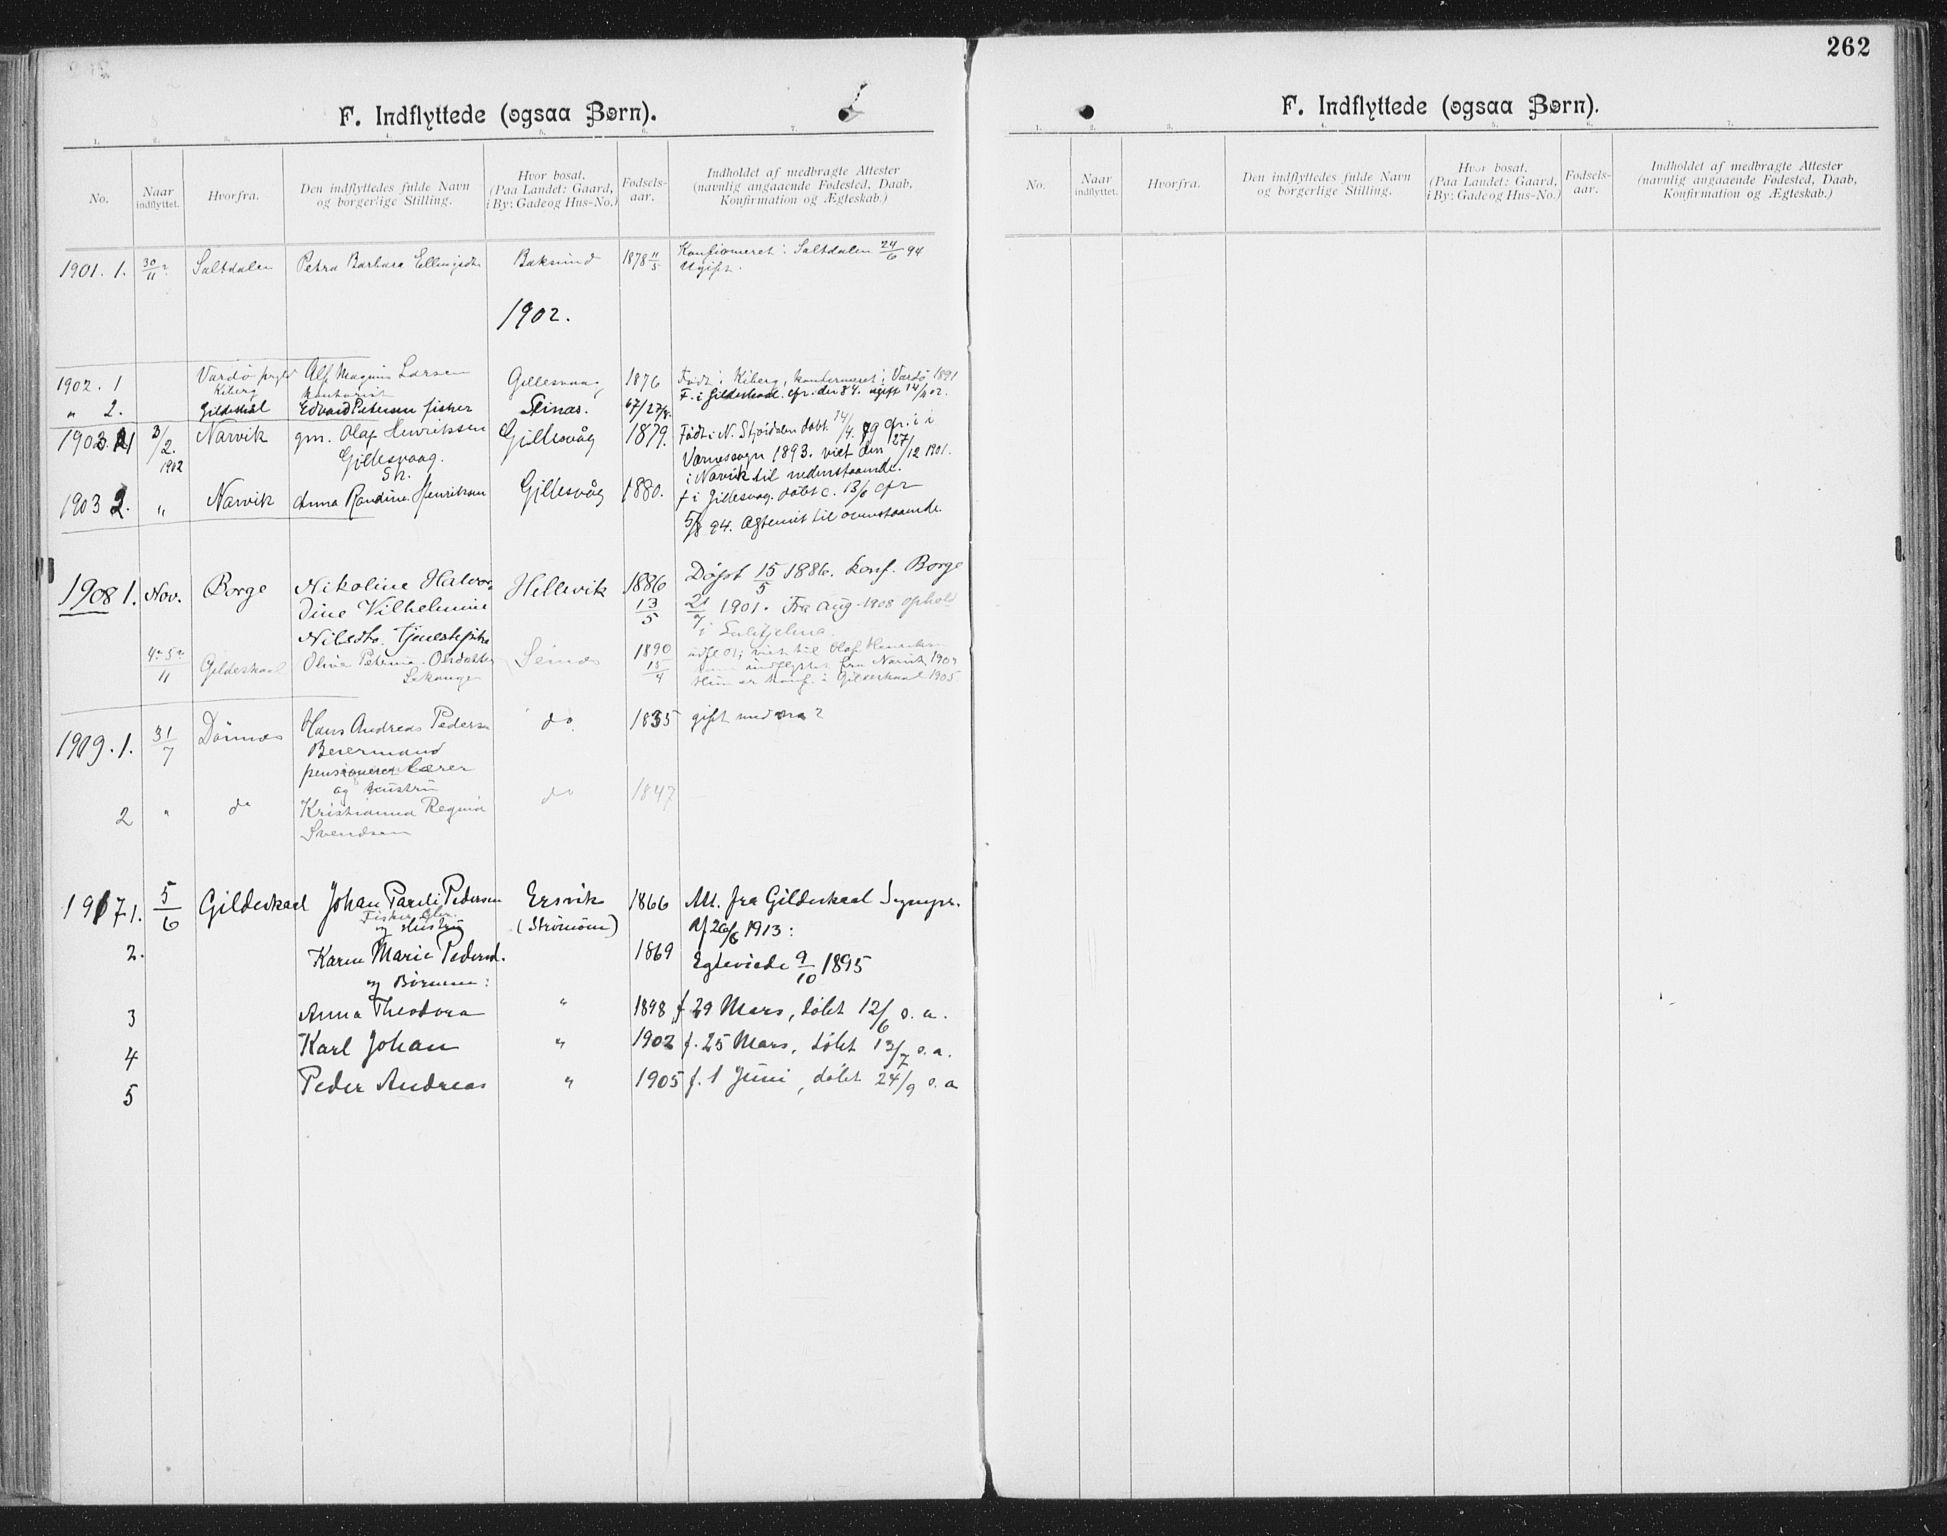 SAT, Ministerialprotokoller, klokkerbøker og fødselsregistre - Nordland, 804/L0081: Ministerialbok nr. 804A02, 1901-1915, s. 262